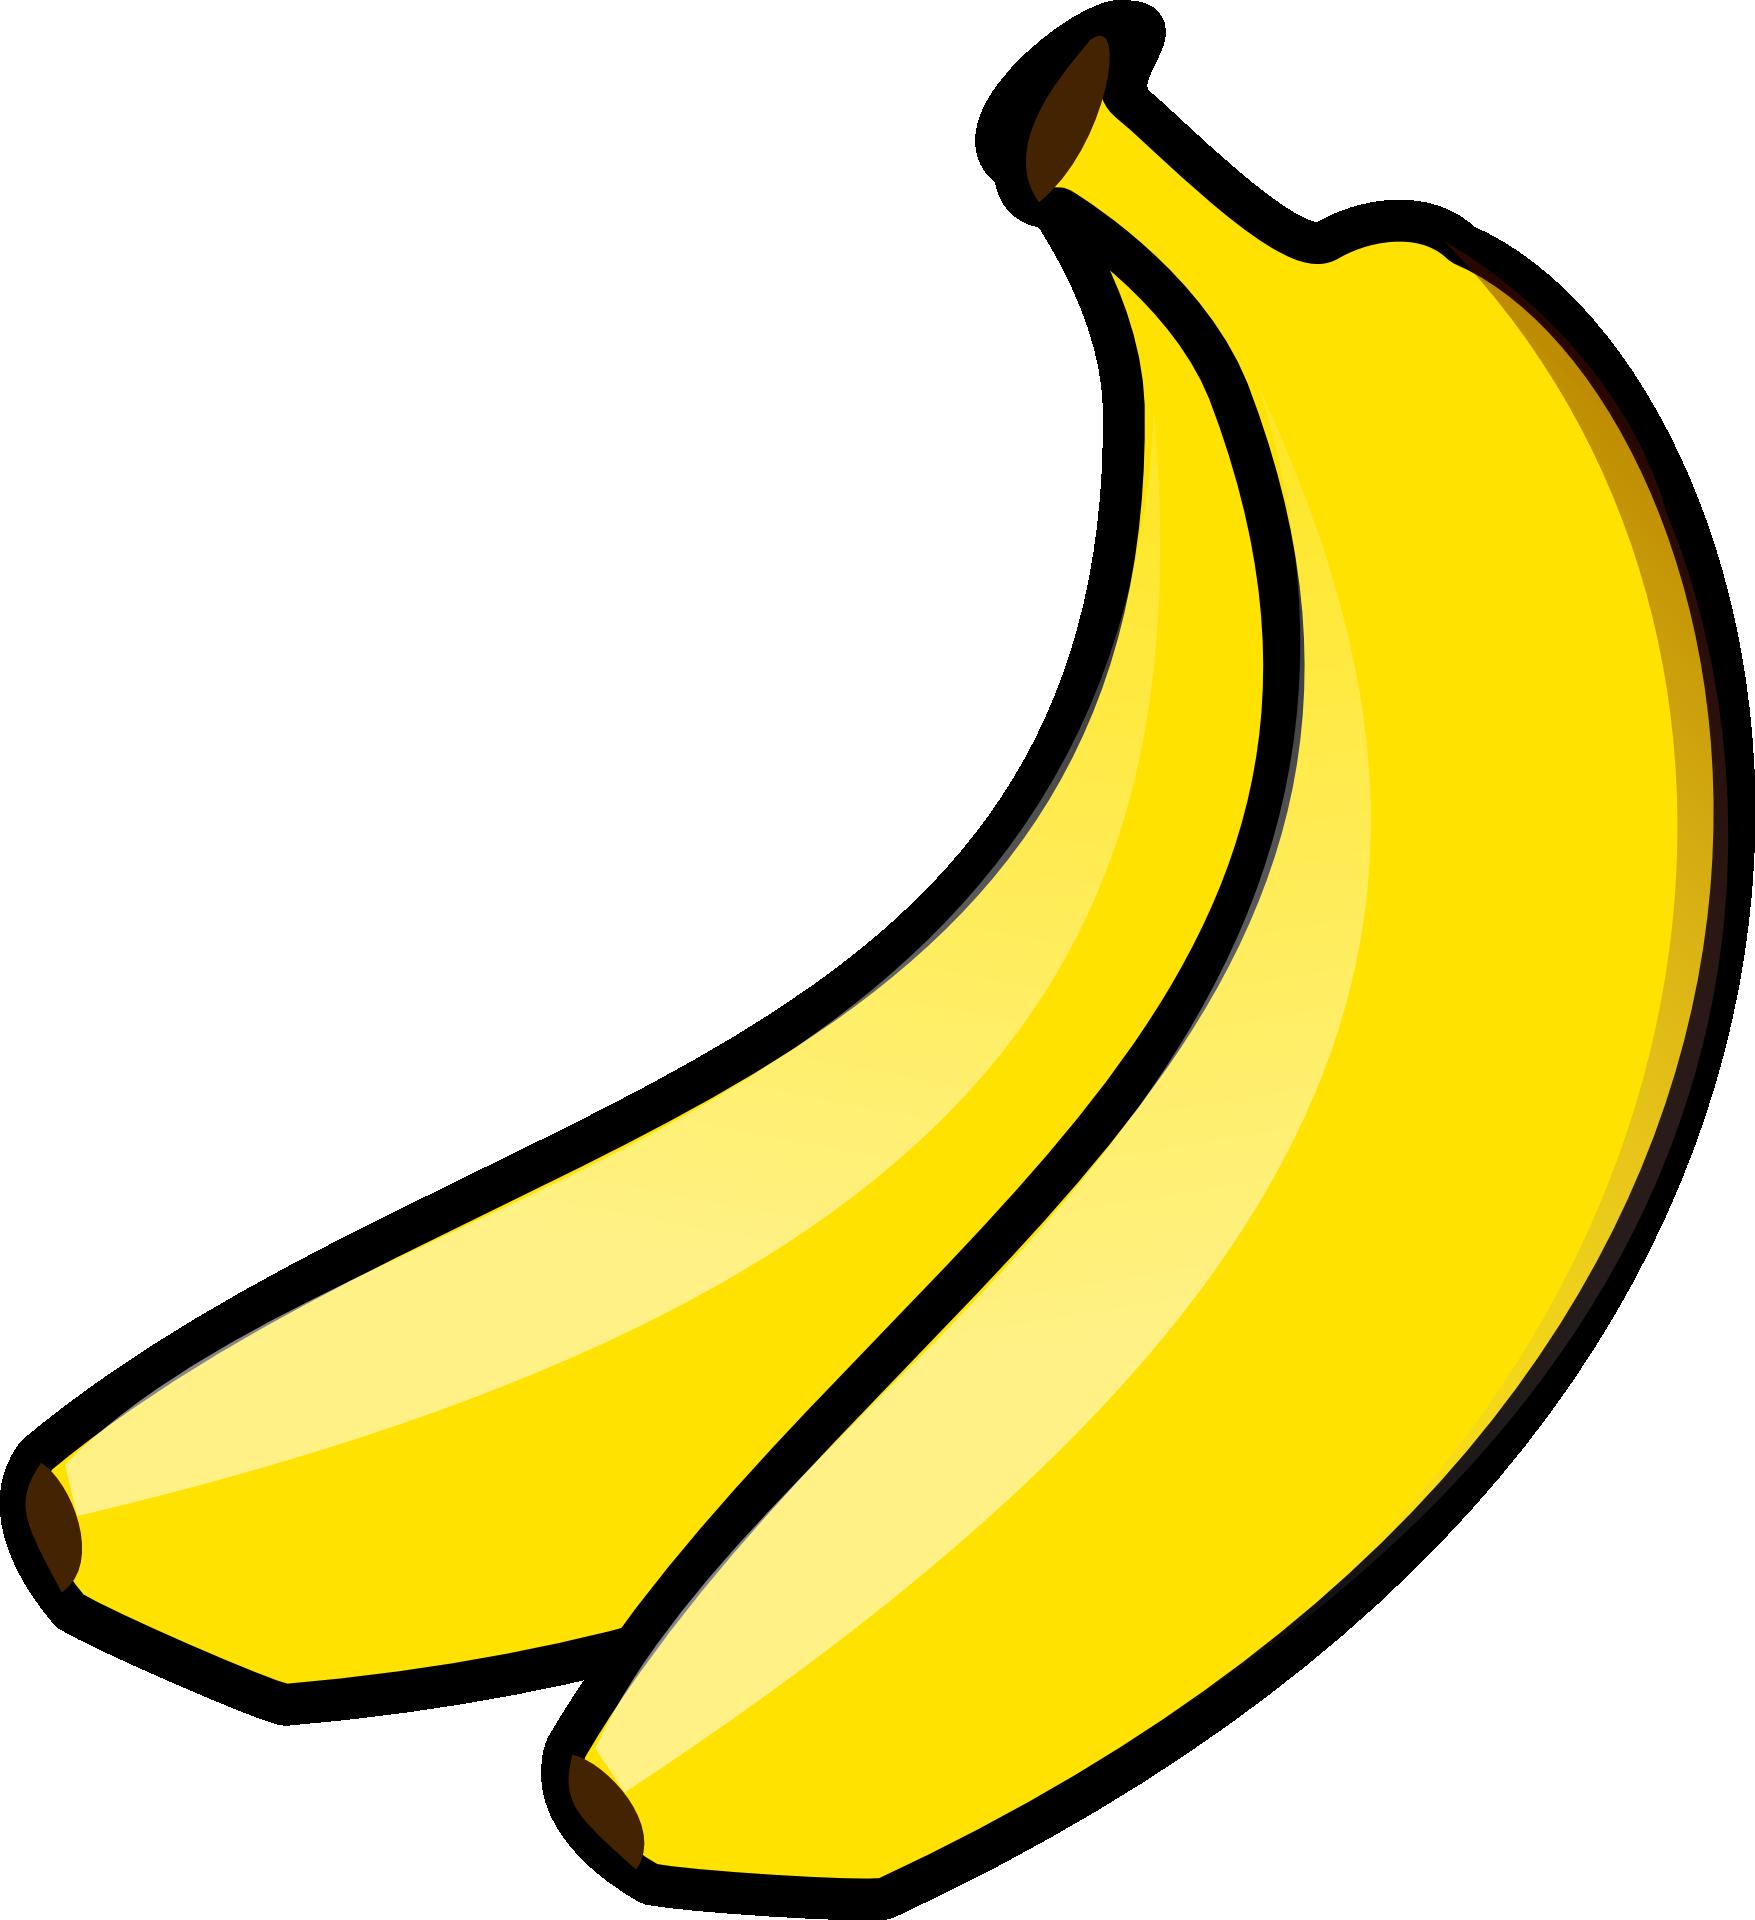 Bananas clipart two. Juicy free image